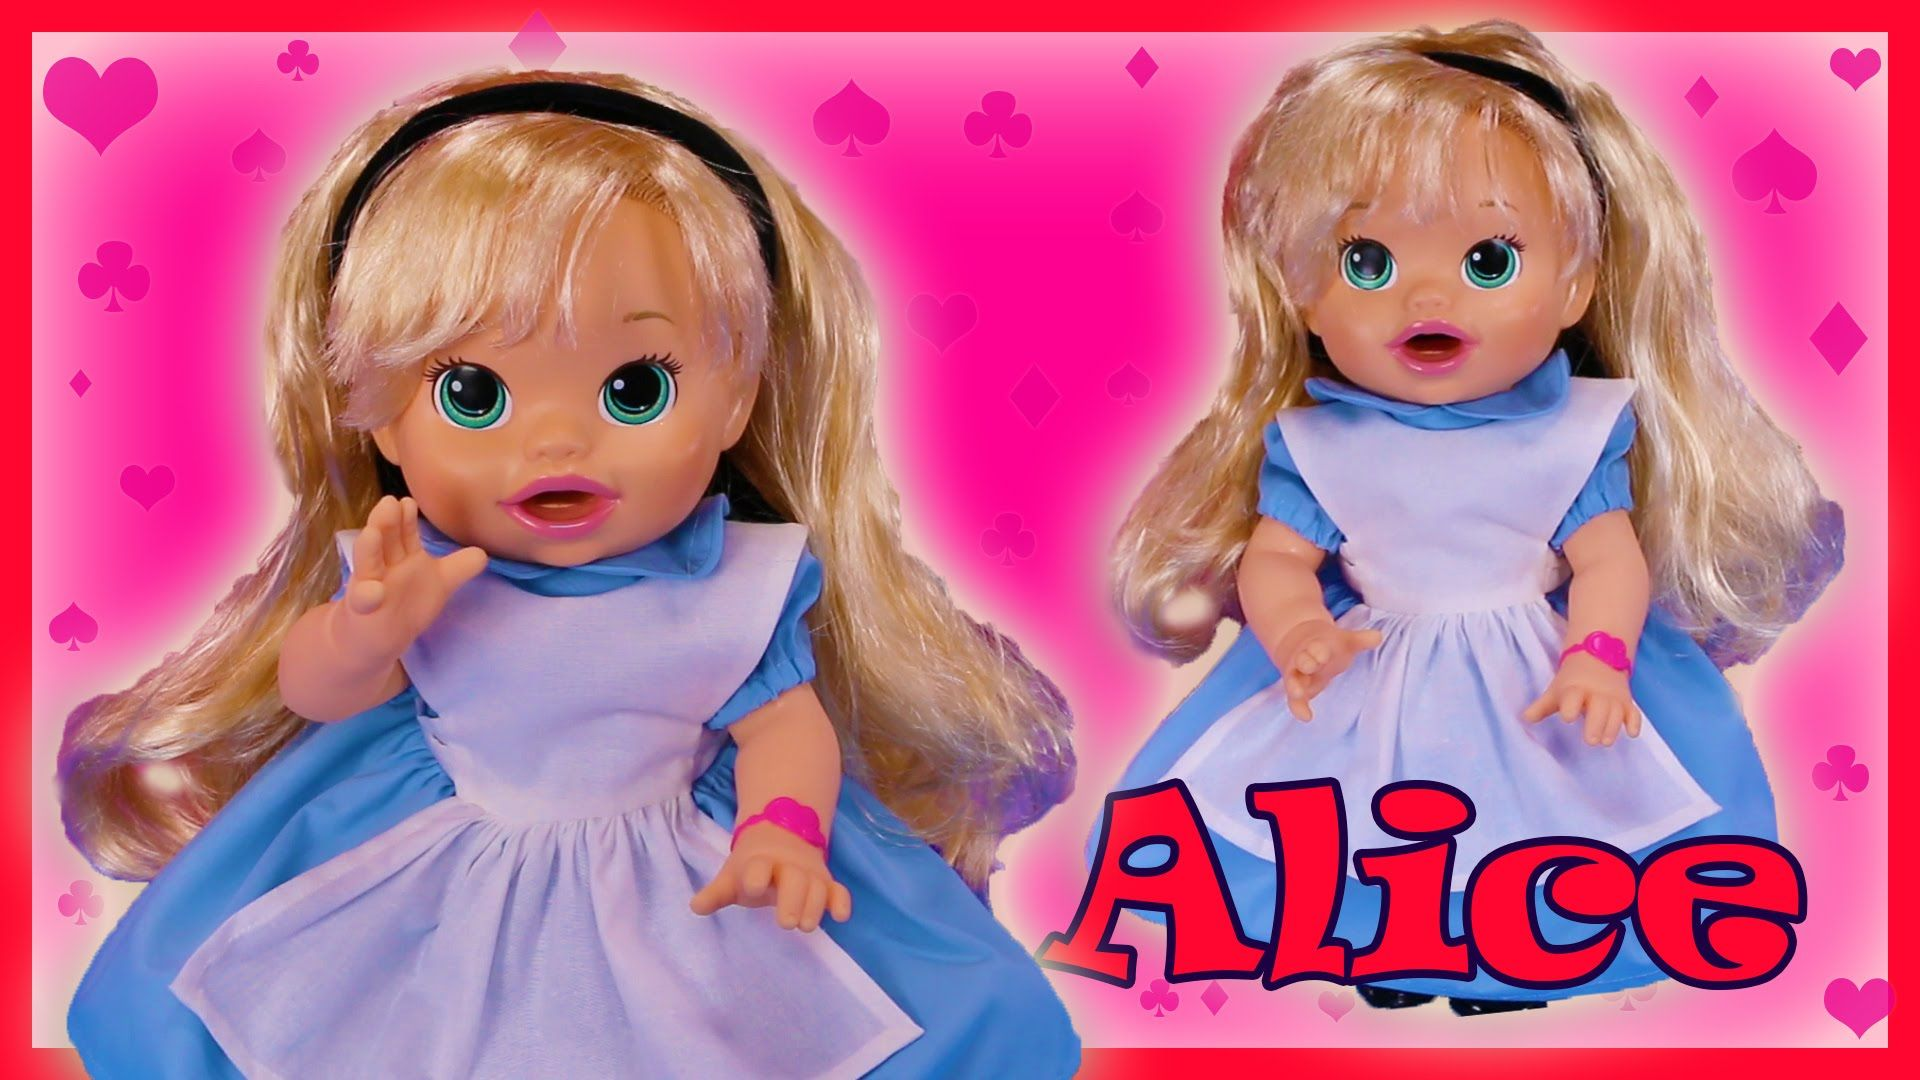 Alice In Wonderland Custom Baby Alive Doll Eats Play Doh Poops Surprises Baby Alive Dolls Baby Alive Custom Baby